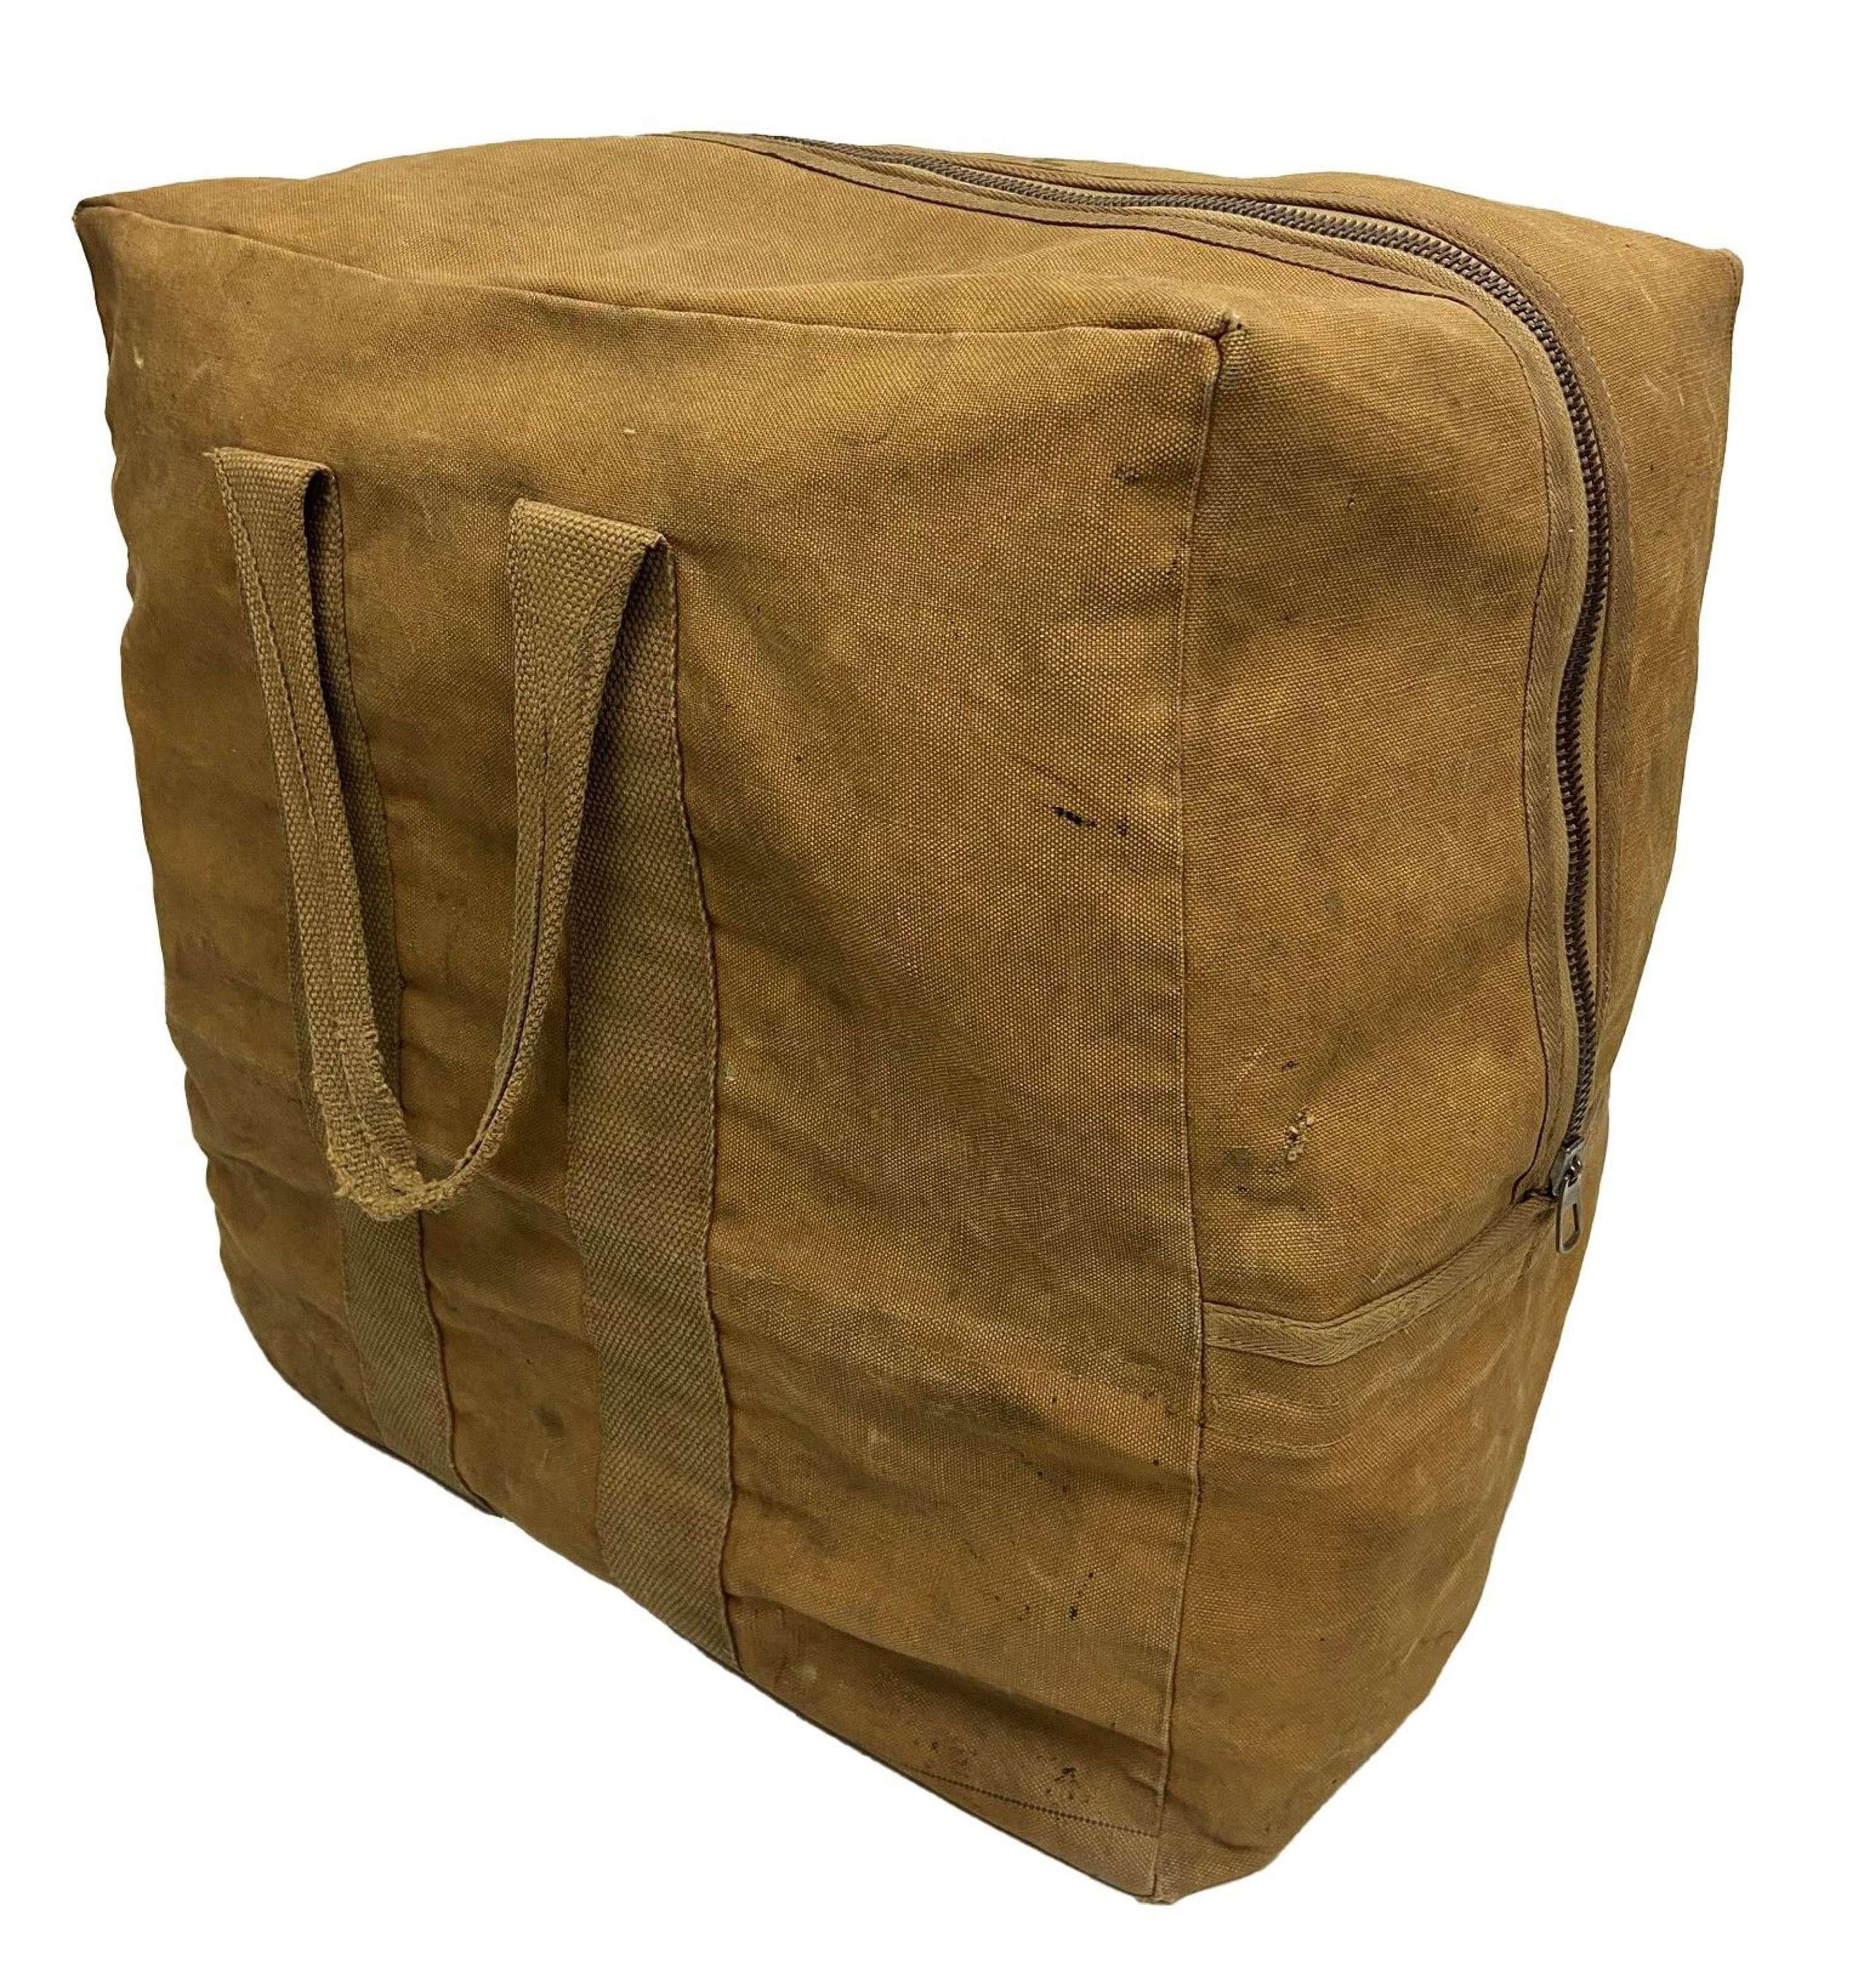 Original WW2 RAF Parachute Bag - Squadron Leader Laurie